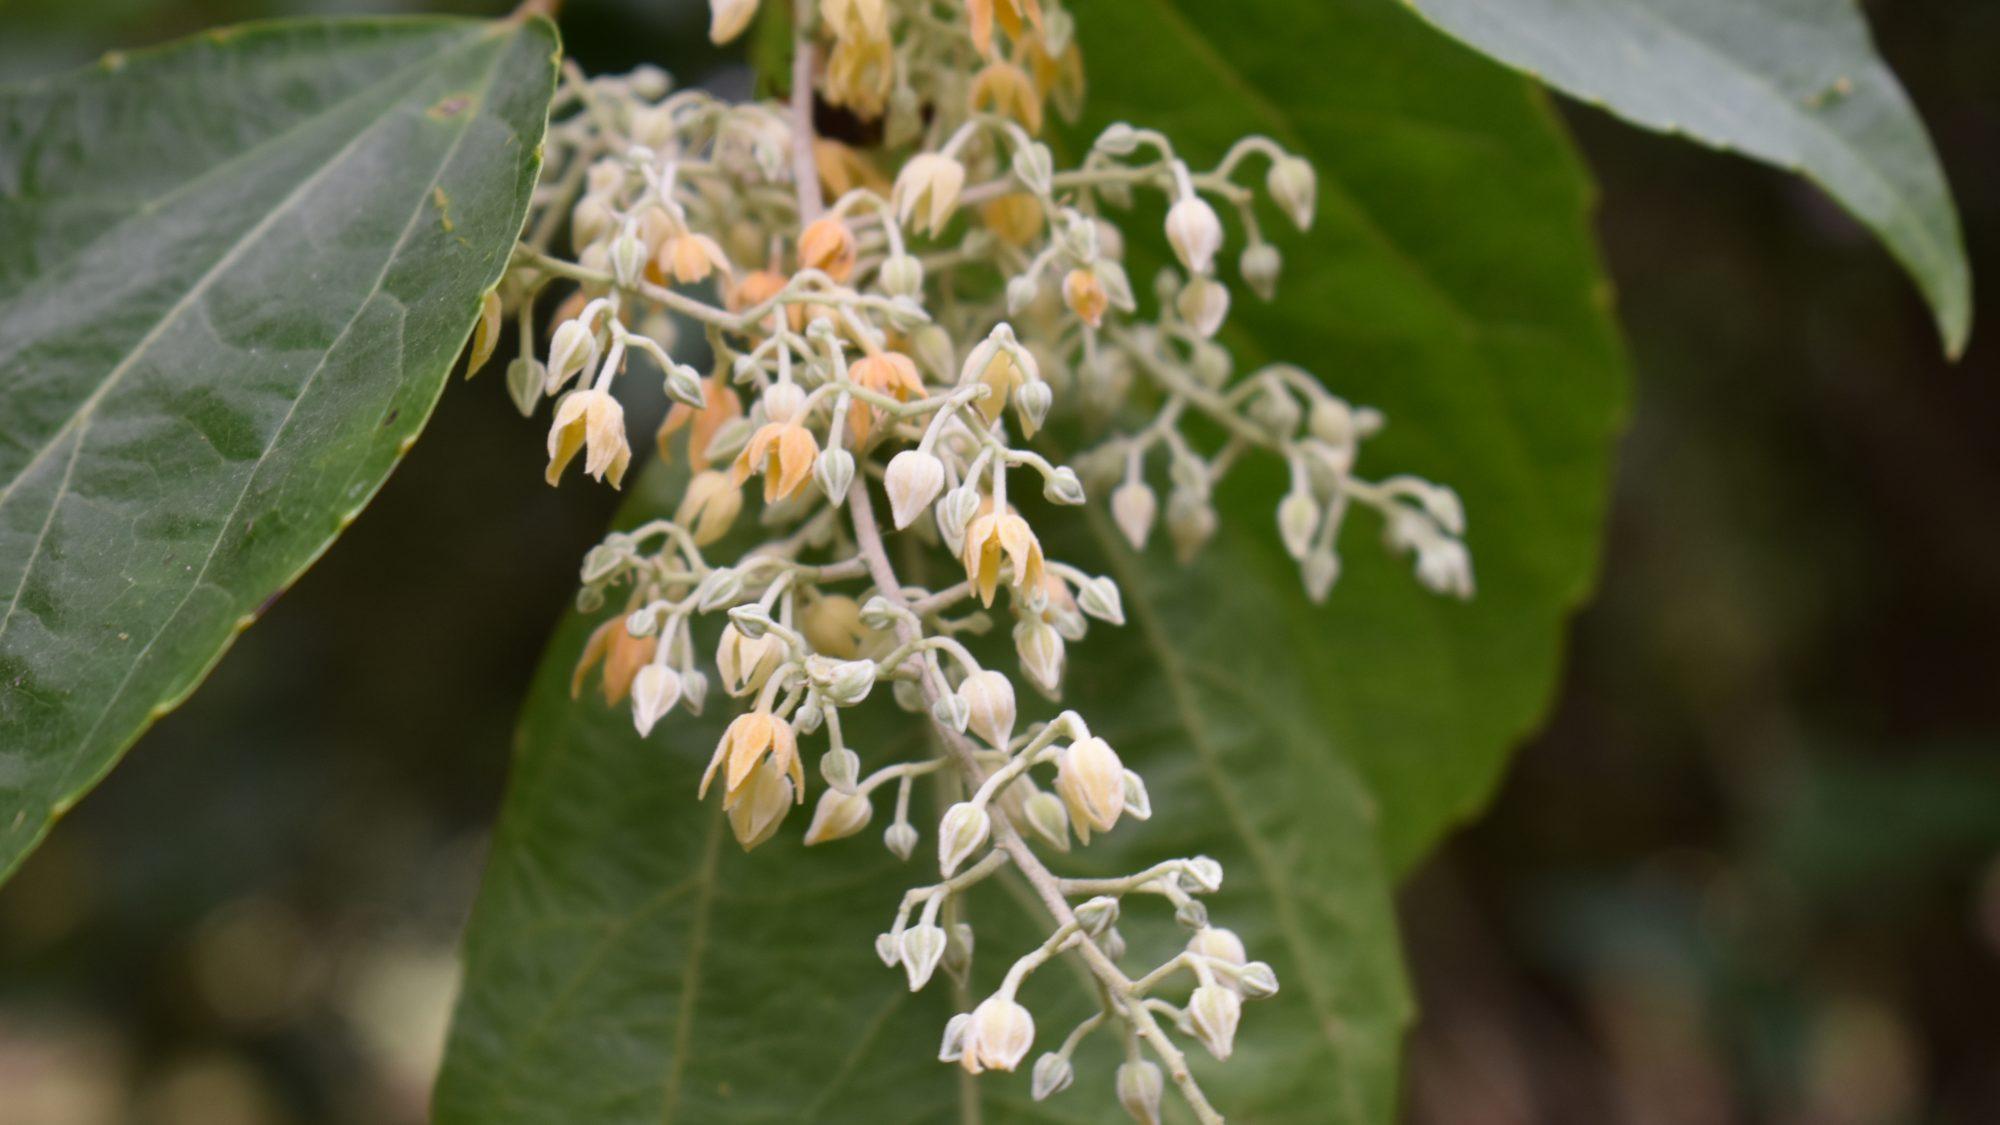 Poliothyrsis sinensis